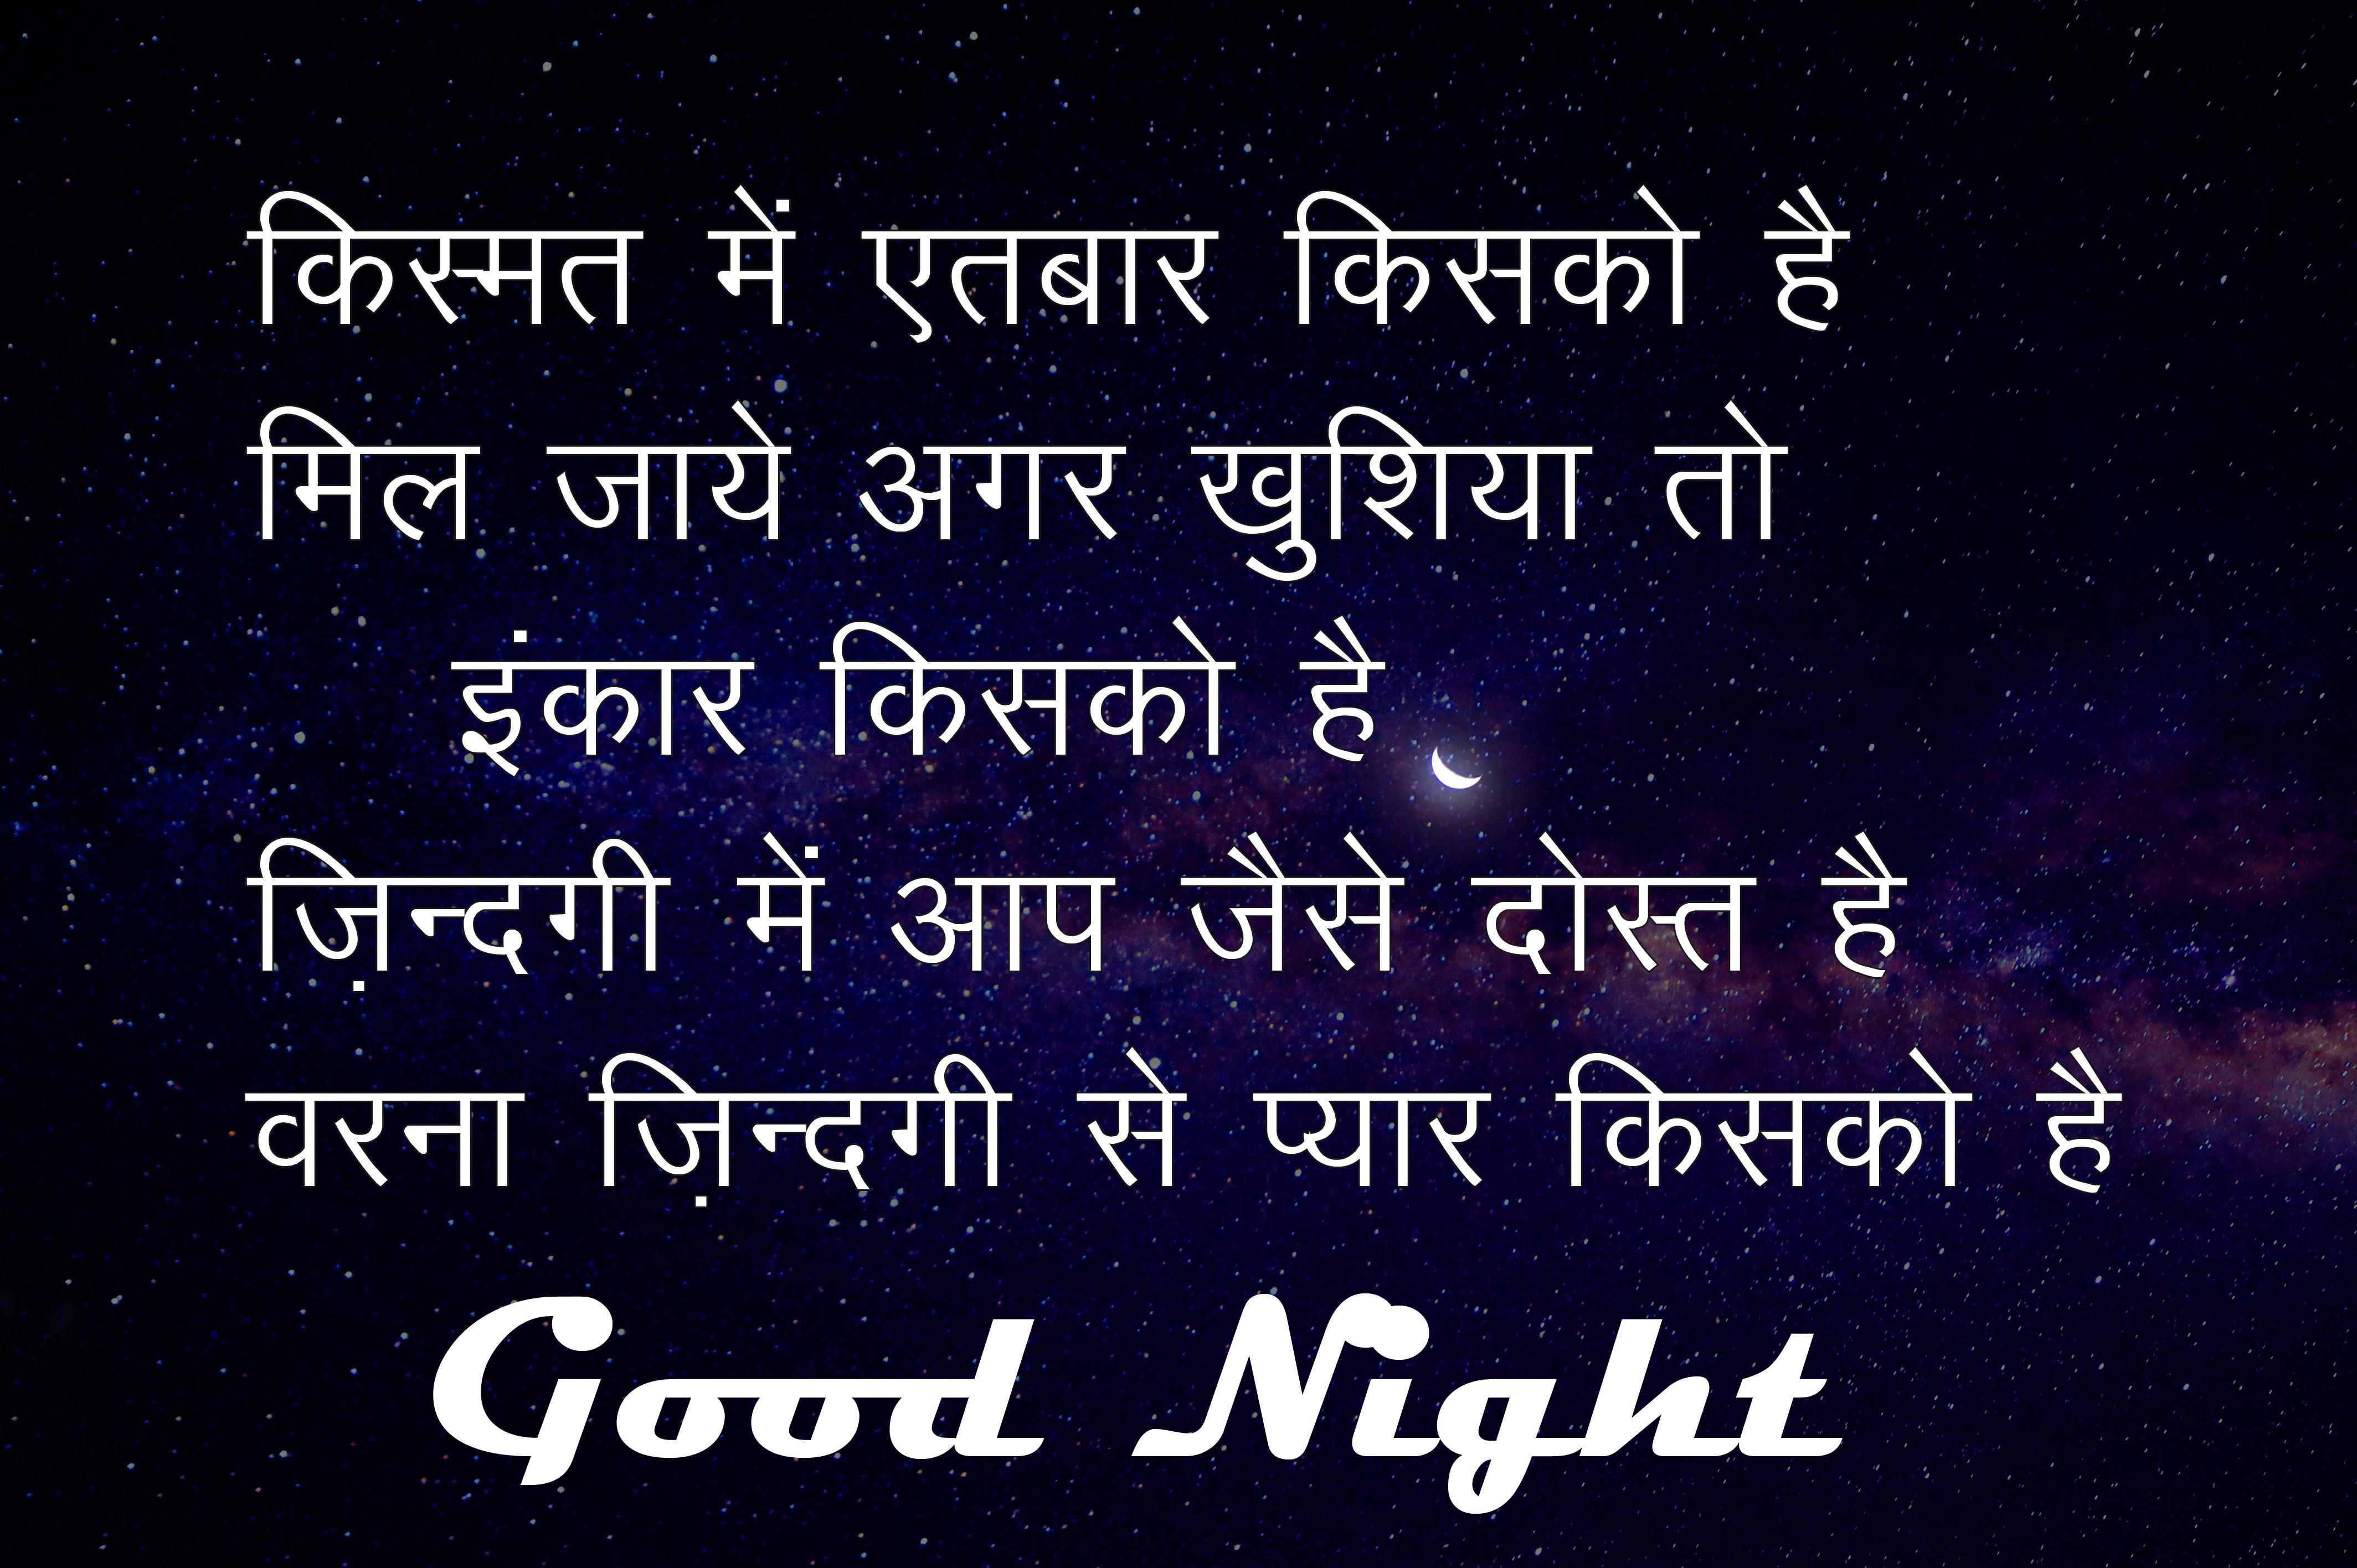 Hindi Shayari Good Night photo for Facebook